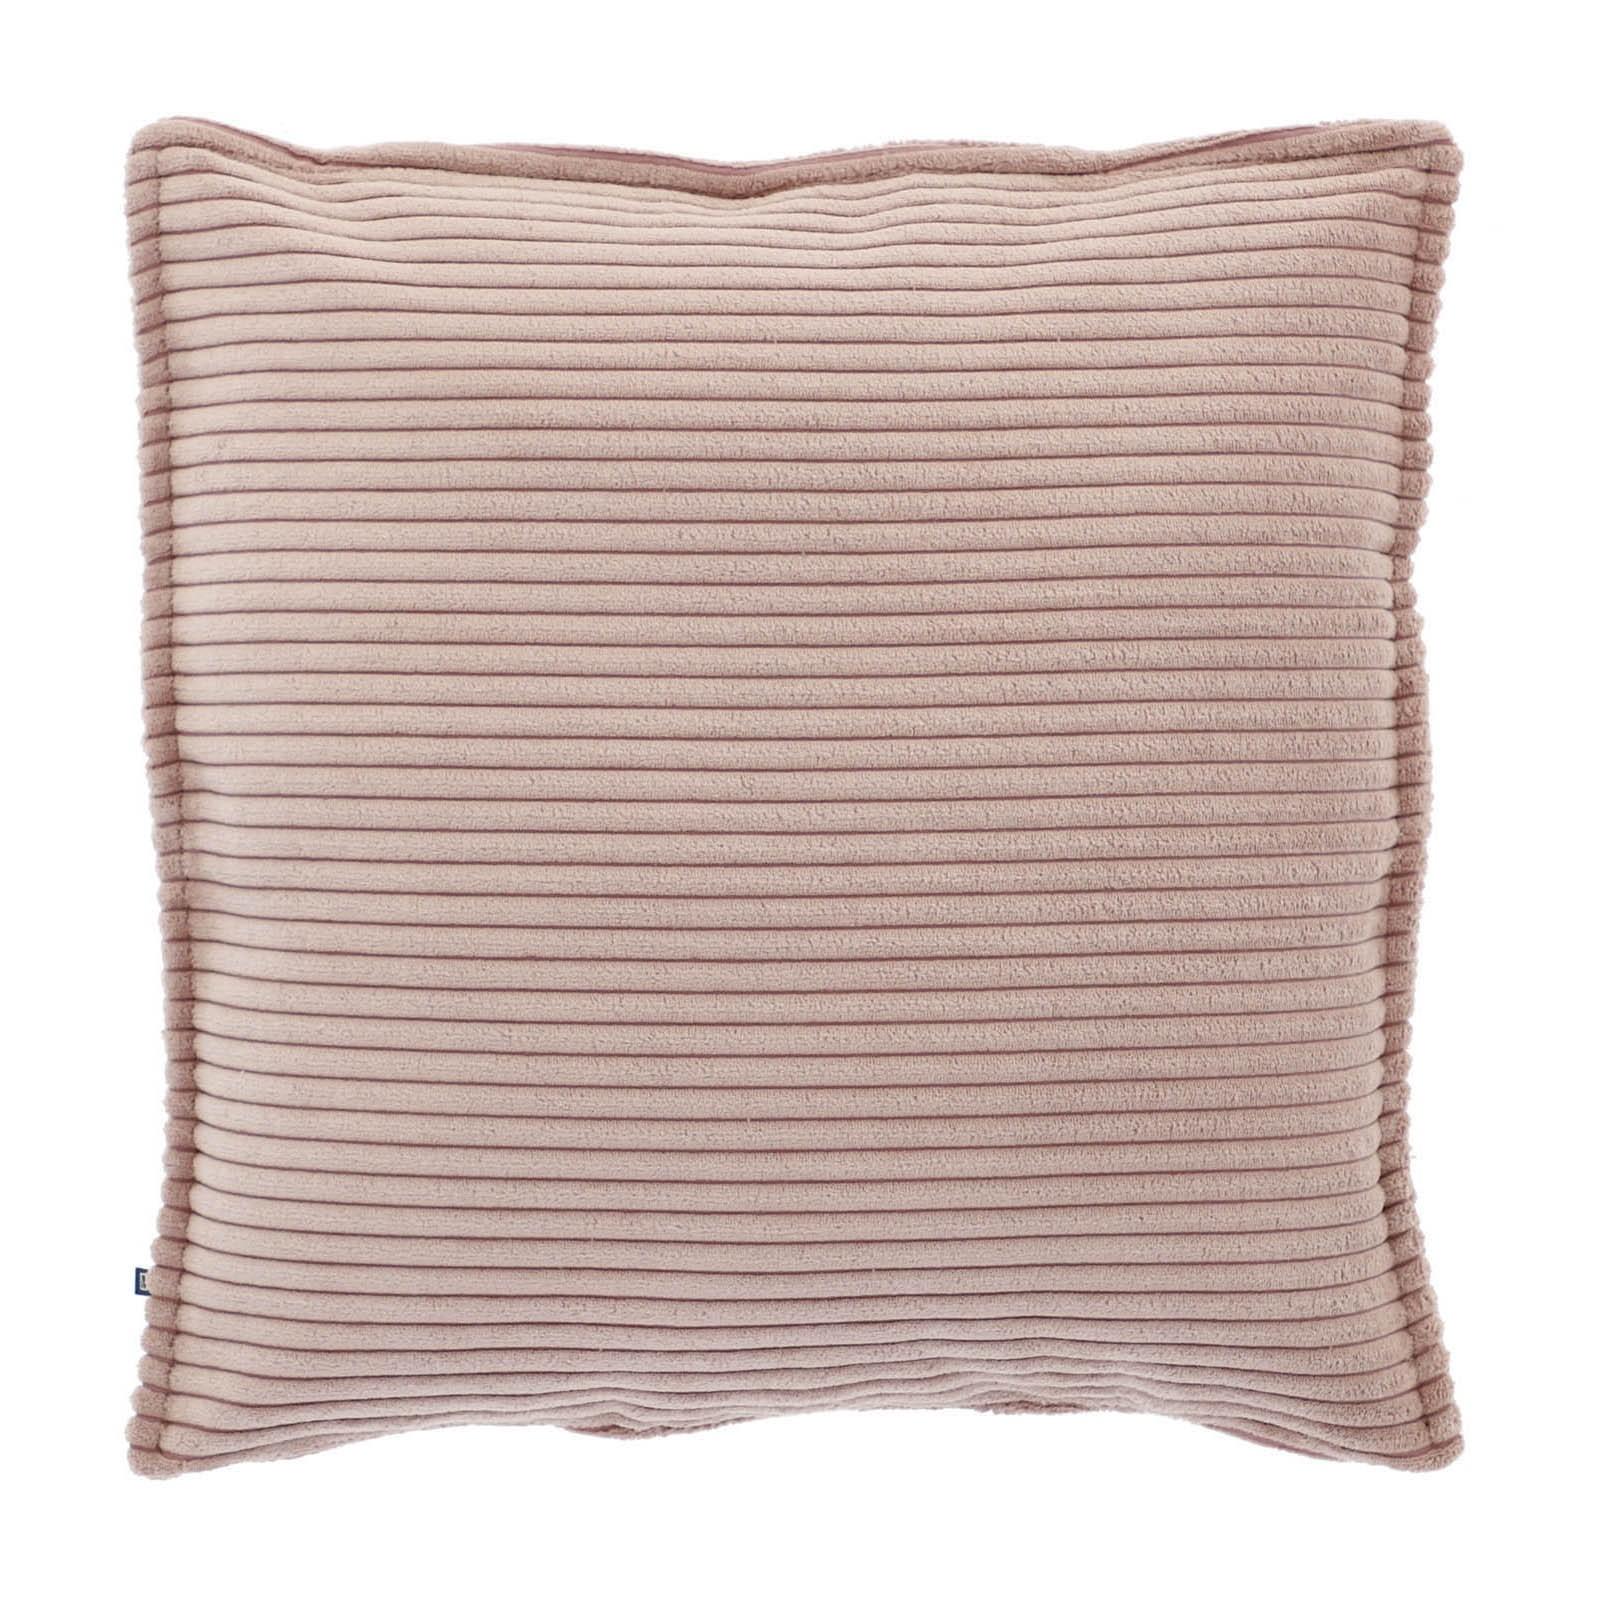 Melrose Corduroy Fabric Scatter Cushion, Blush